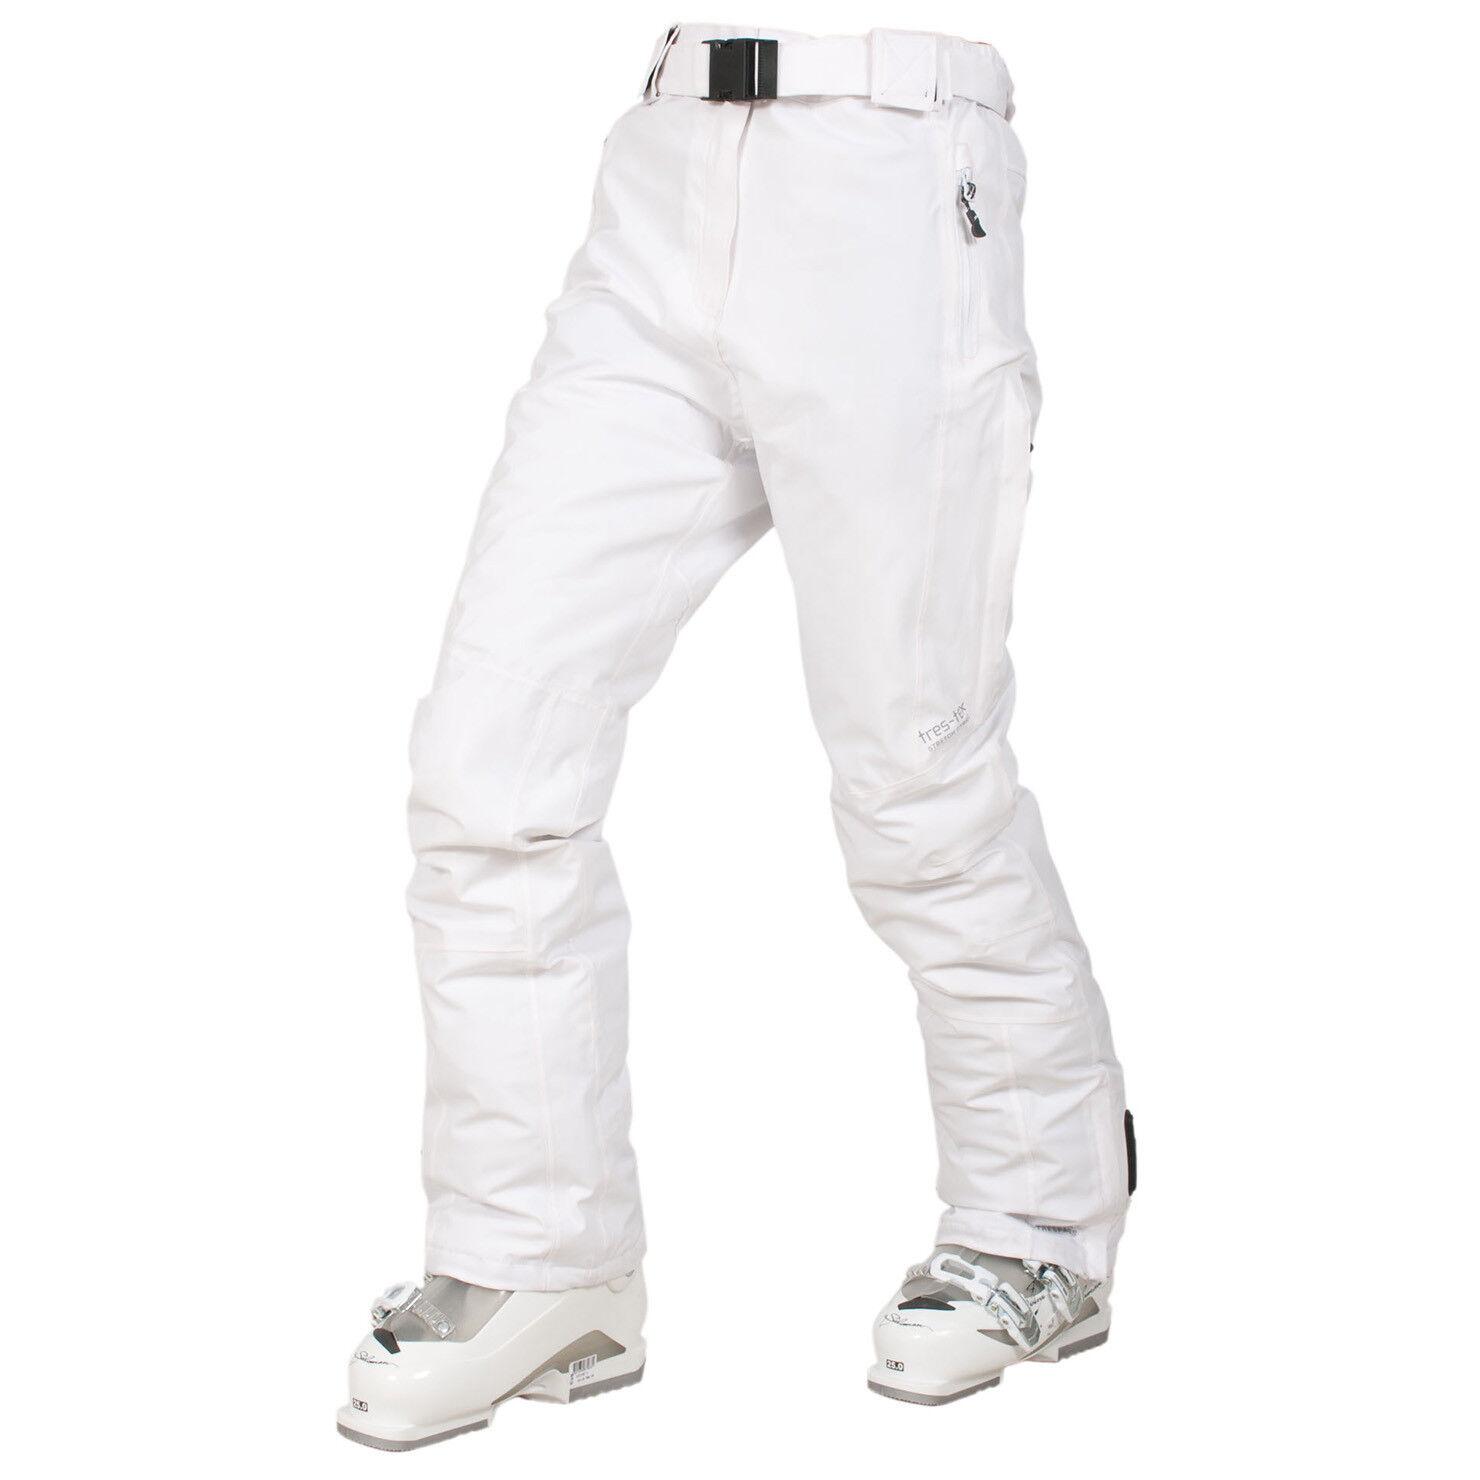 TRESPASS Ski Pants XL UK16 White TP100 Waterproof Windproof  RECCO RescueSolitude  free shipping